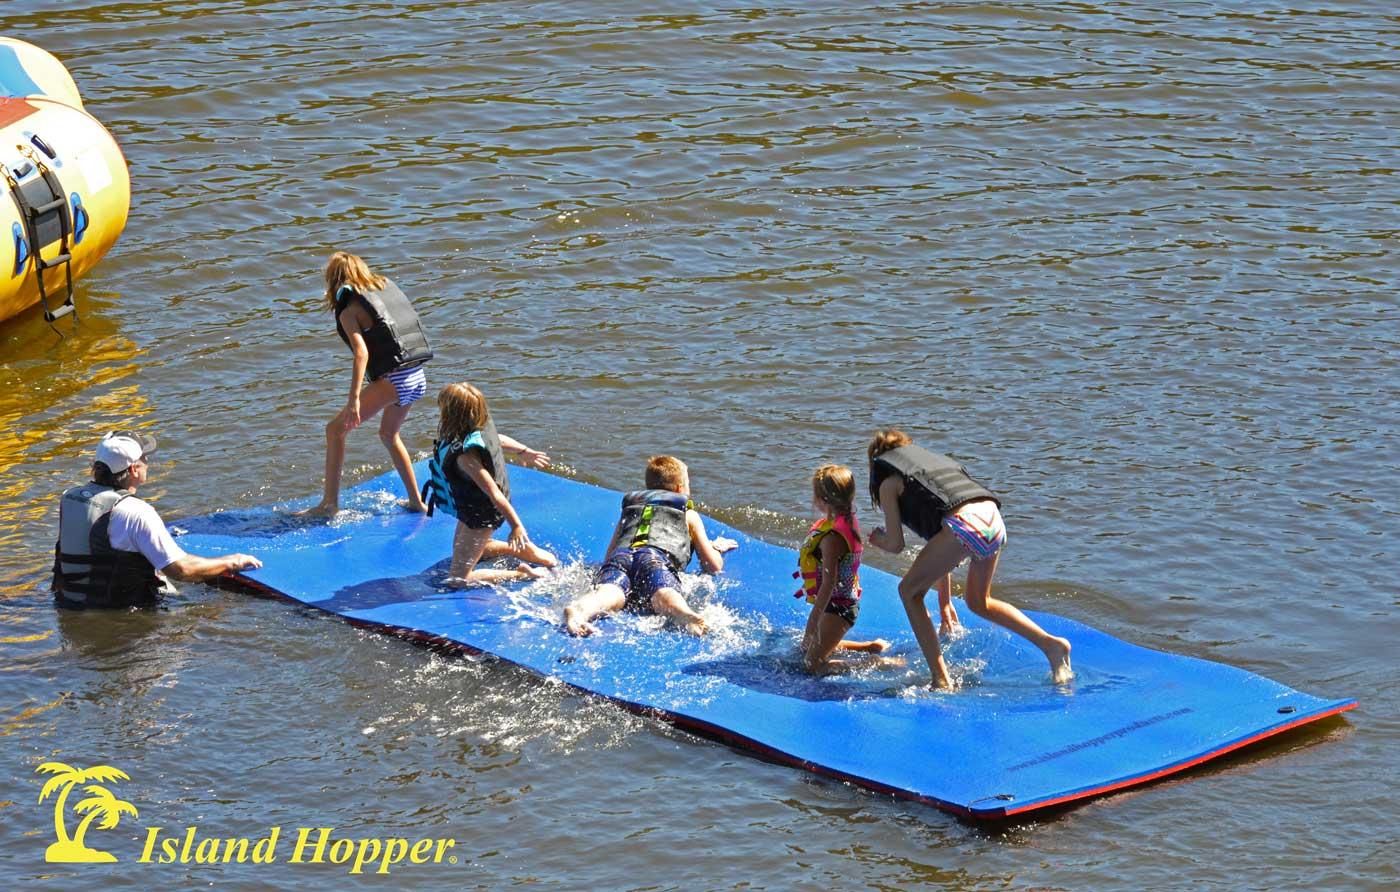 Island Hopper 174 20 Foot Water Walk Floating Foam Mat Super Buoyant Triple Layered Mesh